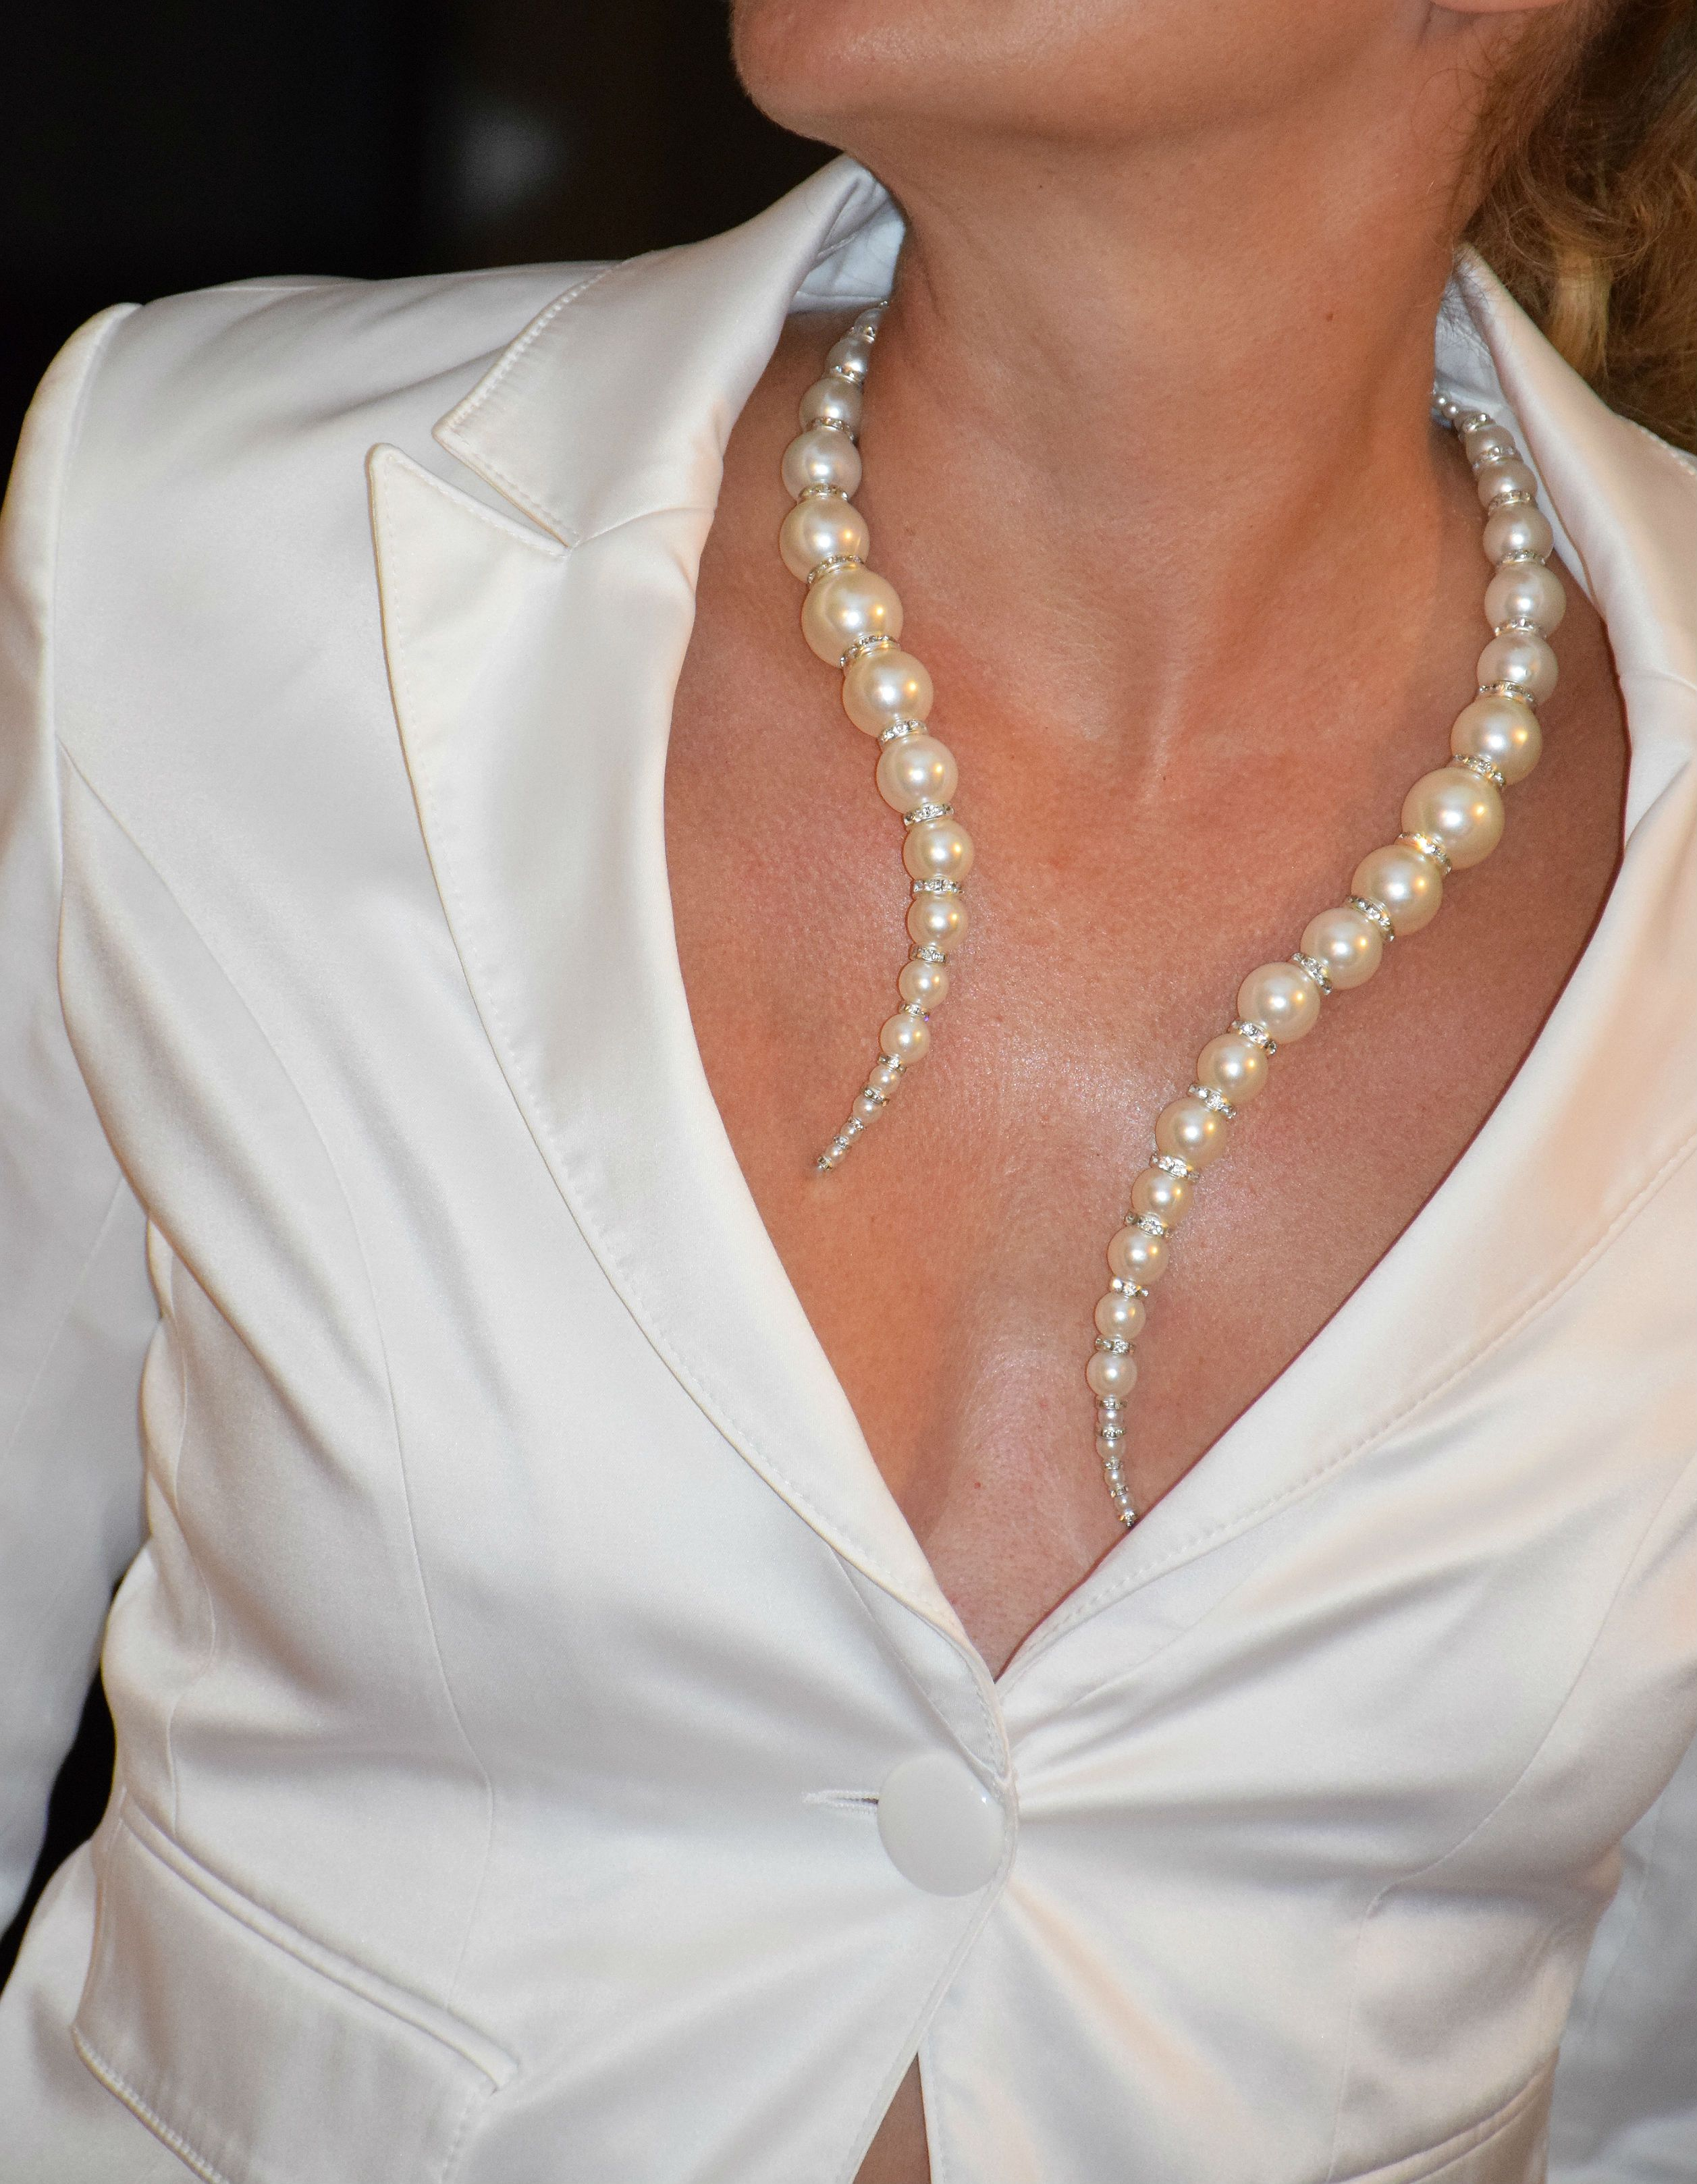 UK Bride Wedding Bridesmaid Pearl Multi-layers Choker Collar Necklace Pendant